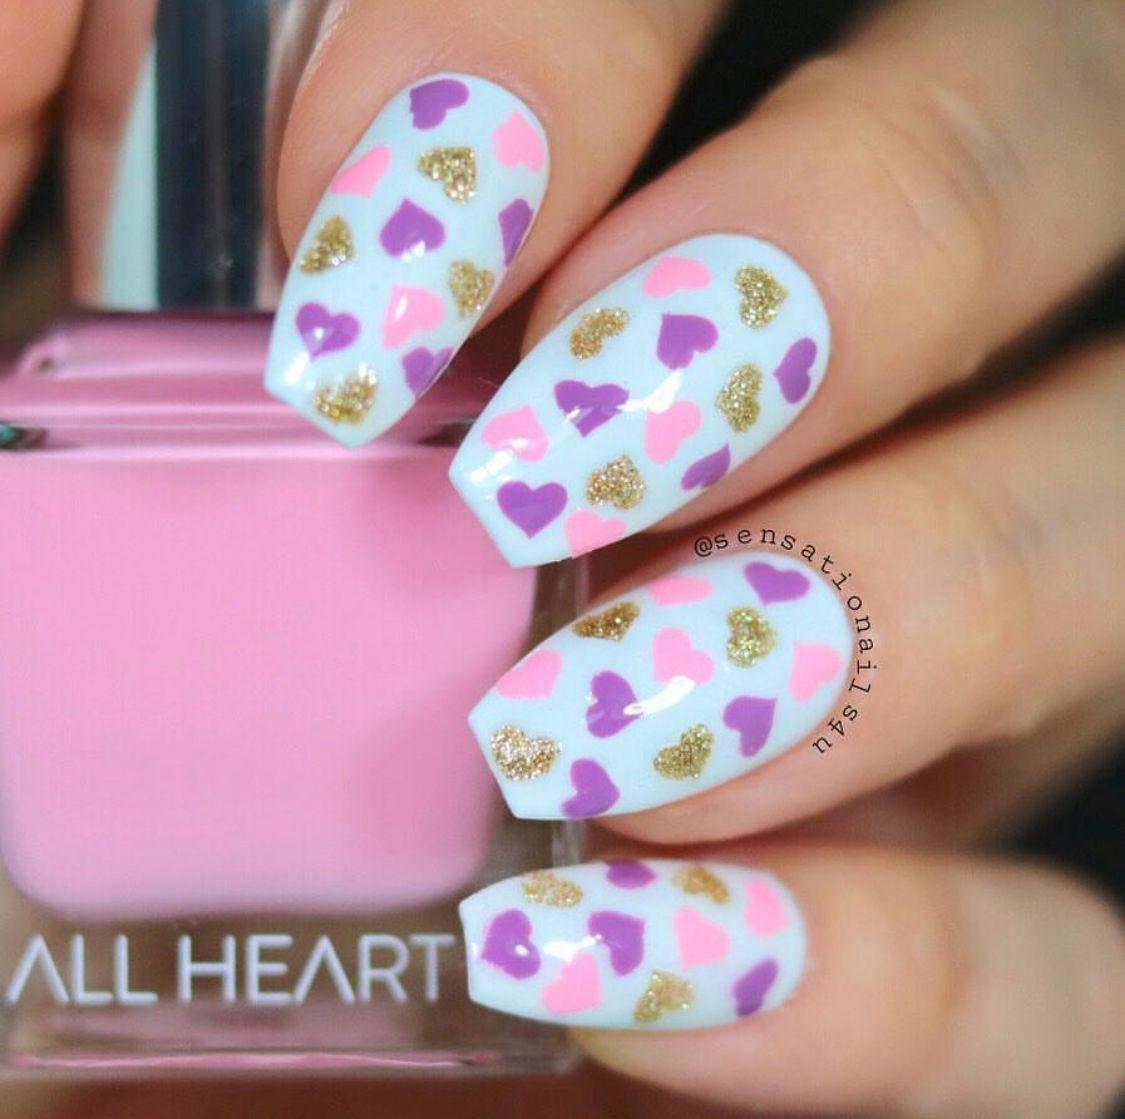 Fun confetti #valentinesday manicure by @sensationails4u using our ...